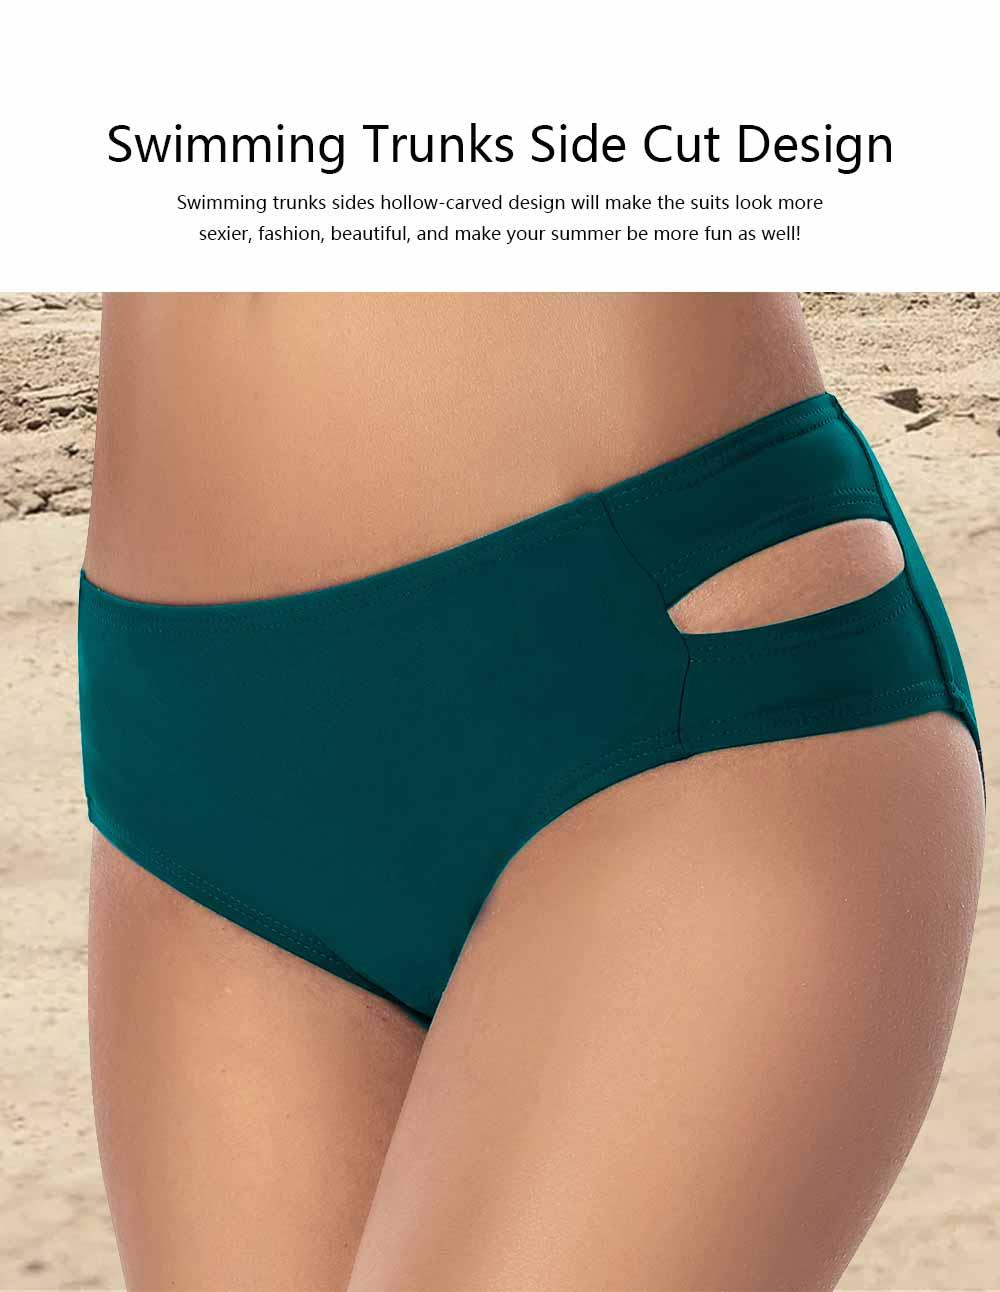 Women Cross Straps Bikini, Removeable Soft Cup Bikini, High Elastic Two Piece Swimming Suits for Ladies Girls 4